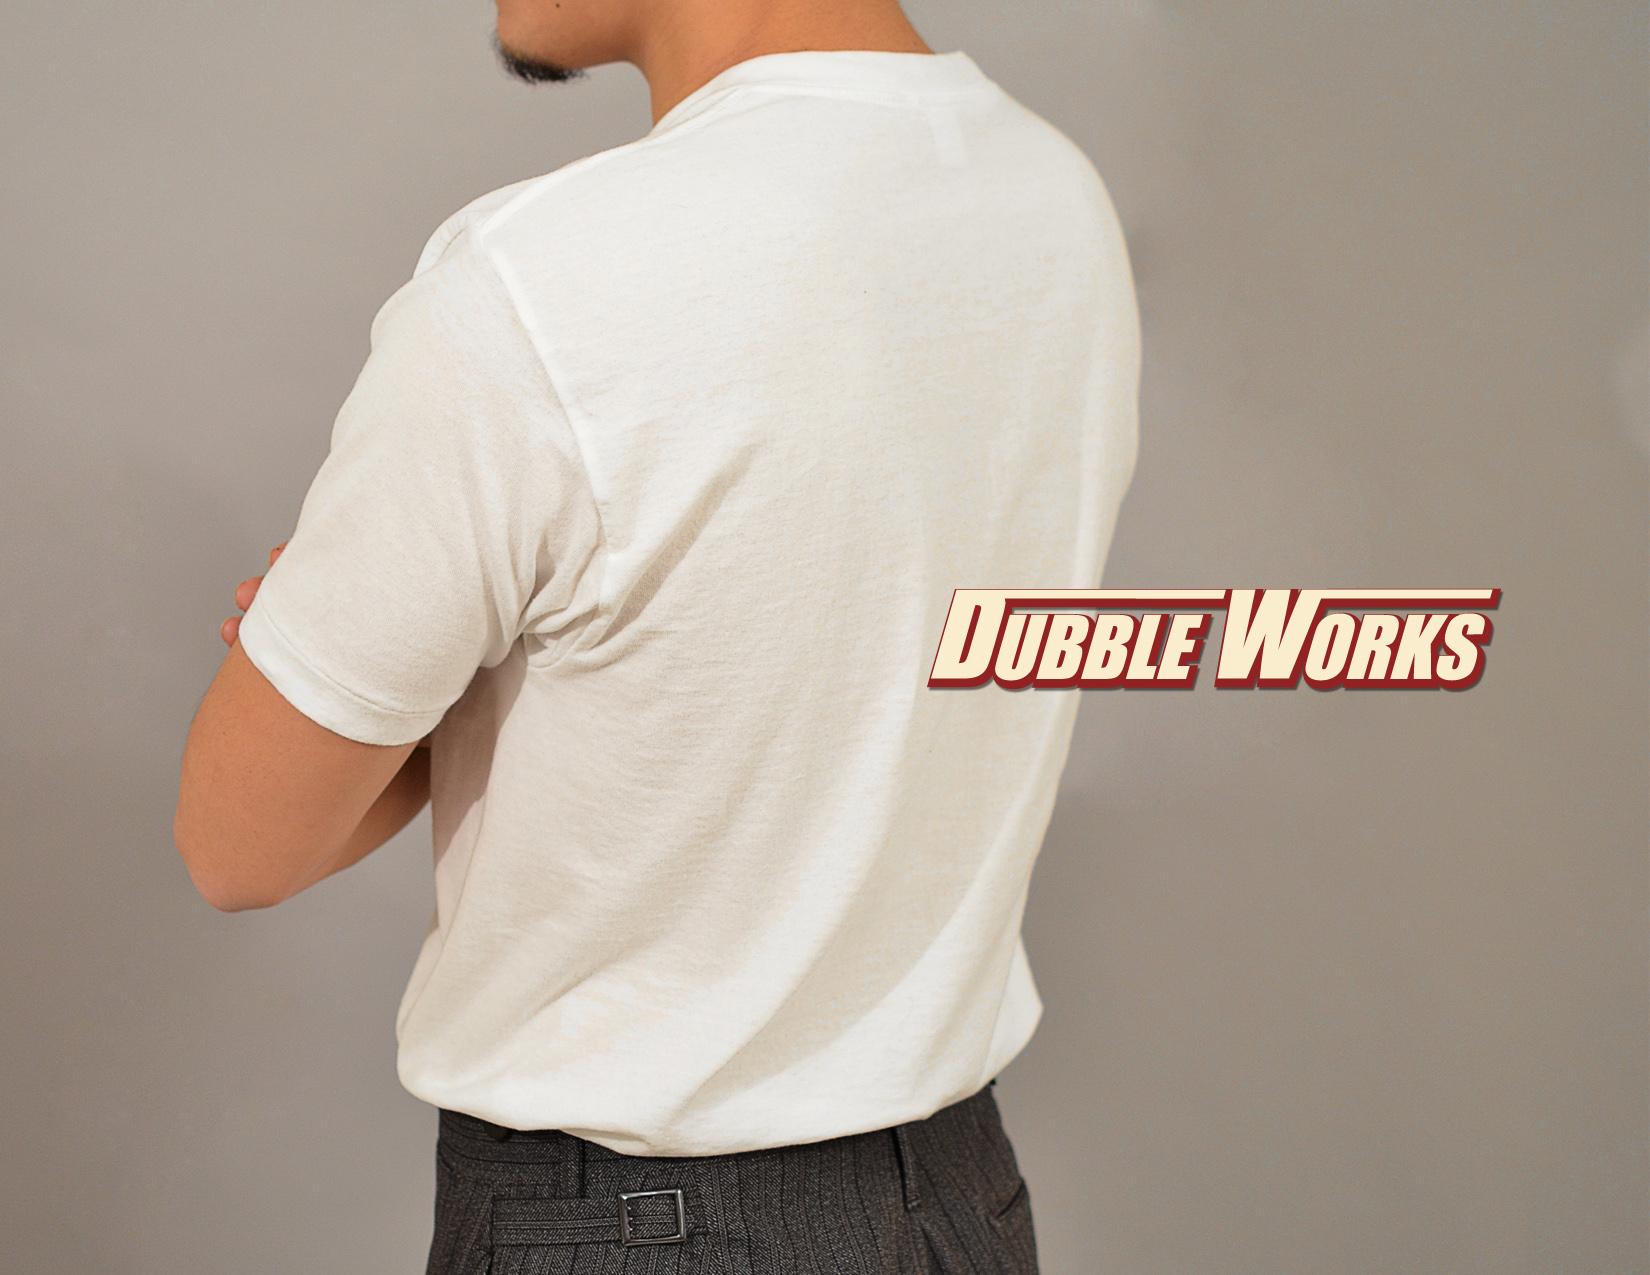 Dubbleworks FW17 Lookbook_Page_1.jpg